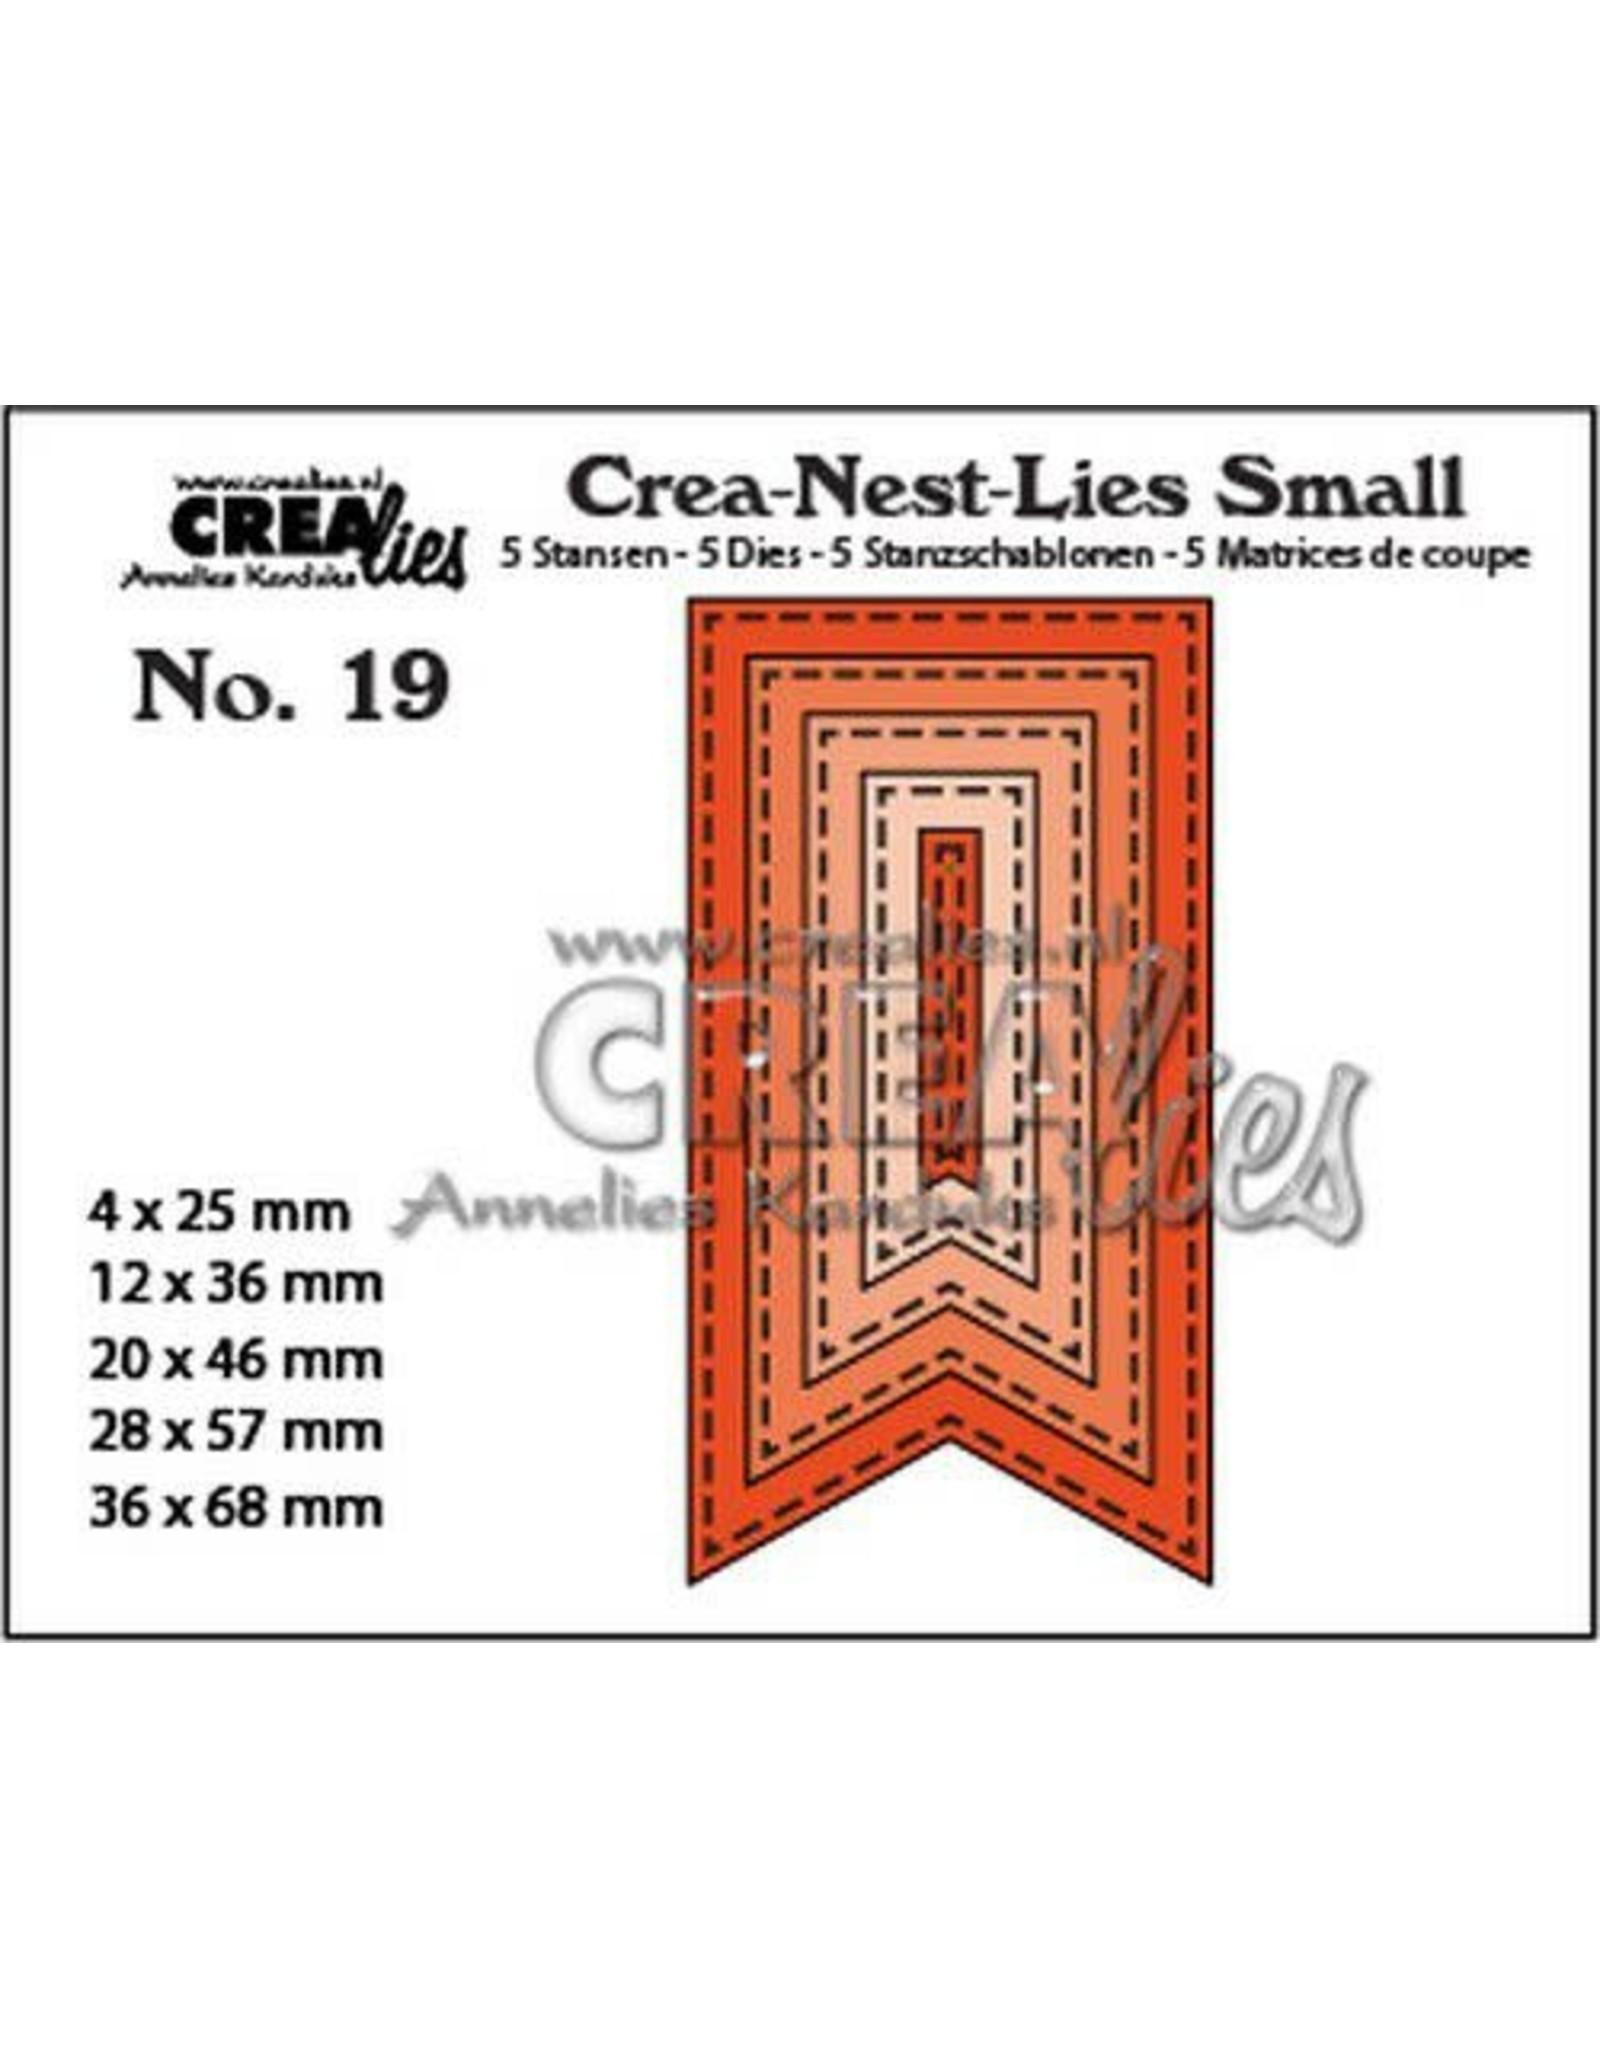 Crealies Crealies Crea-nest-Lies Small Vaandels met stiklijnen (5x) CNLS19 / max. 36 x 68 mm